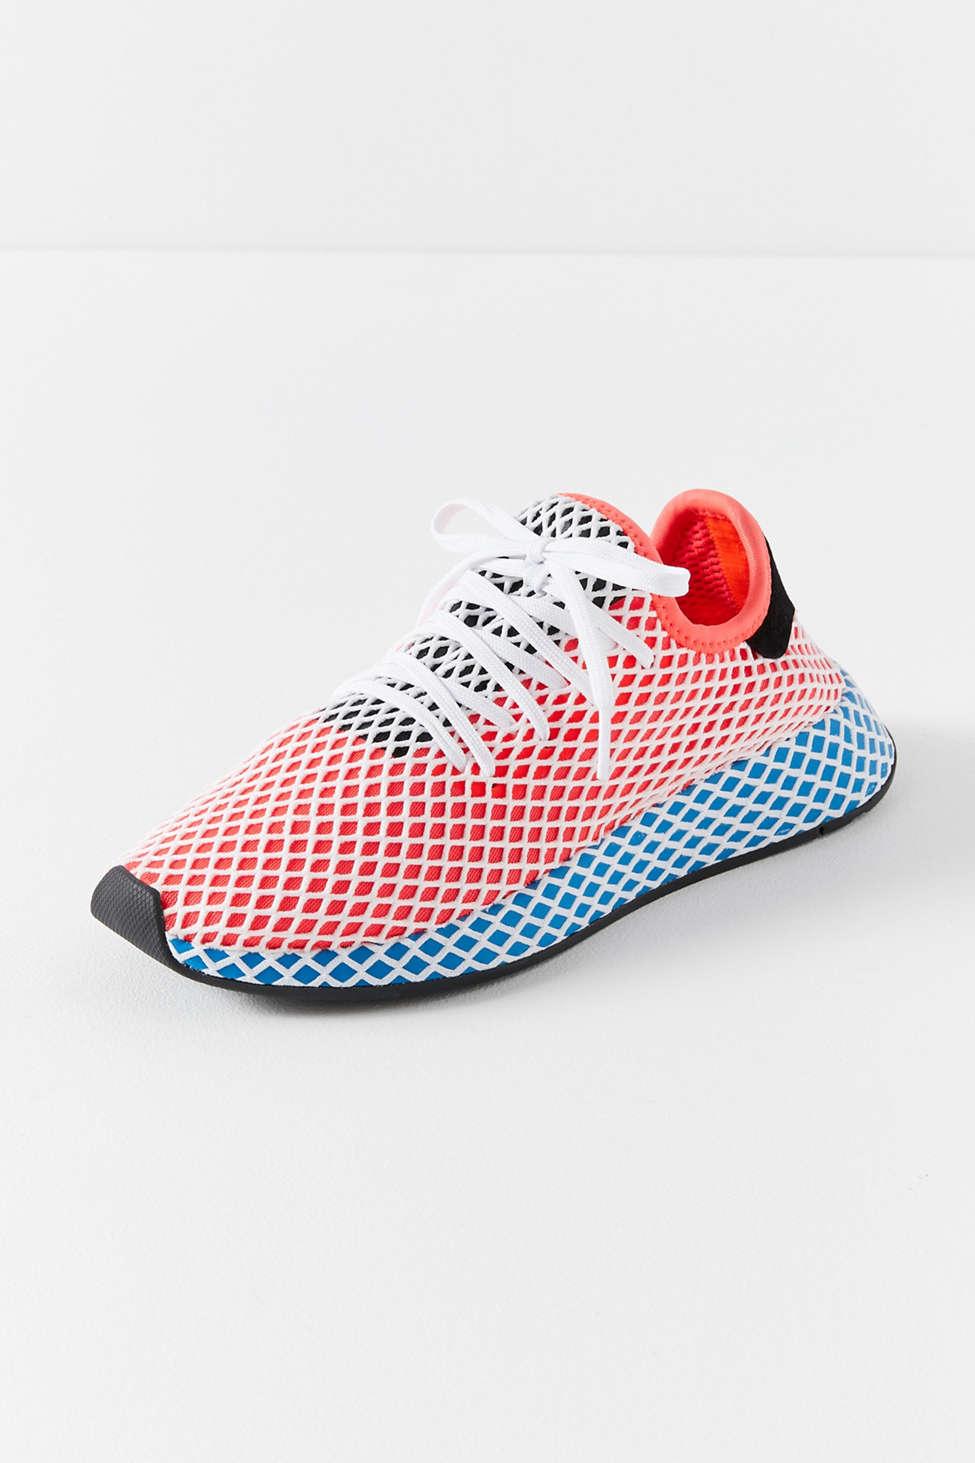 deerupt laufen adidas sneaker urban outfitters kanada